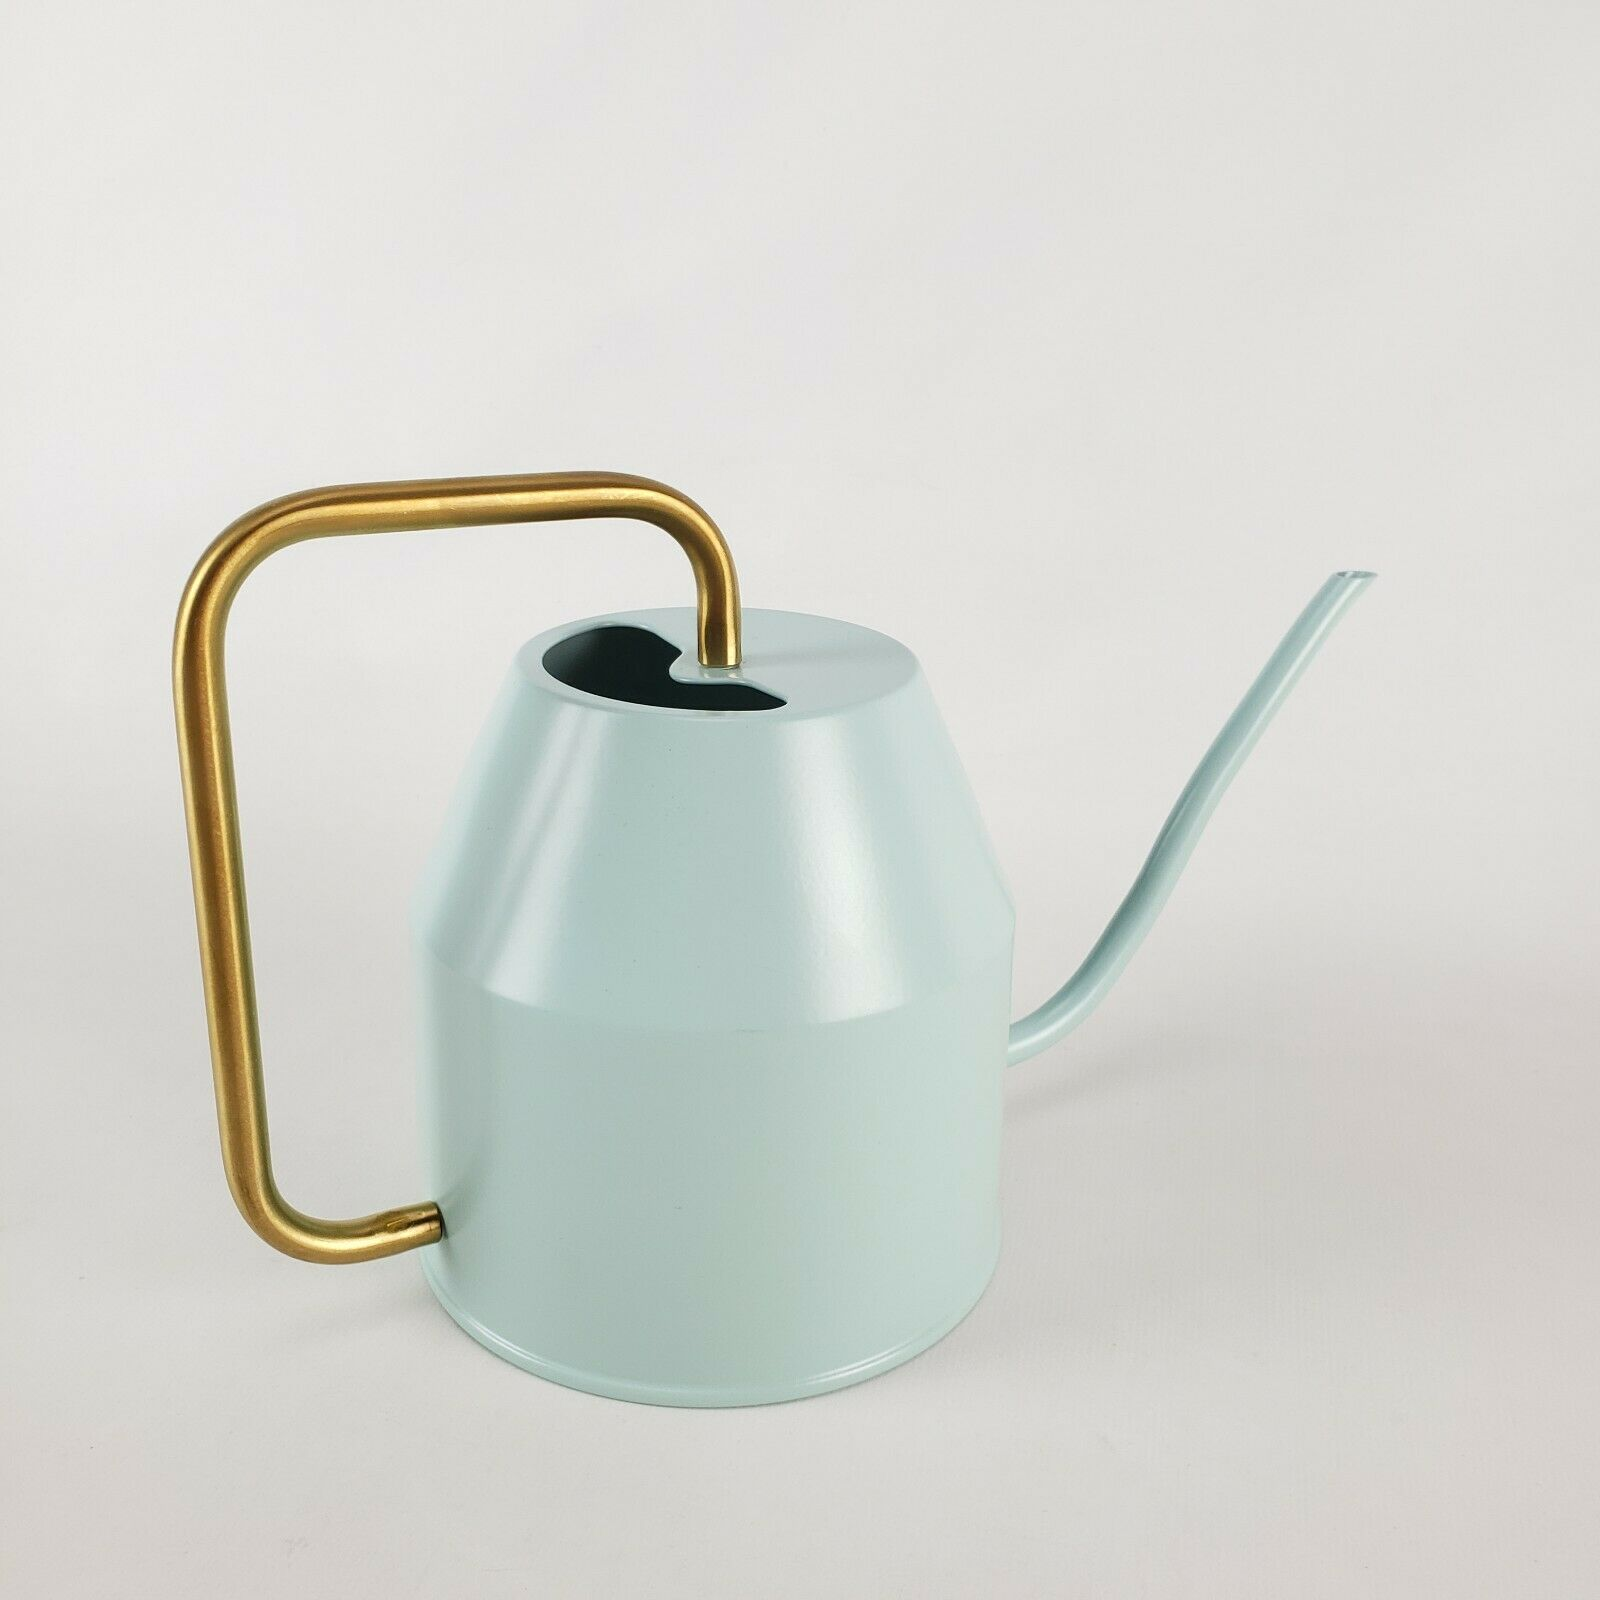 IKEA Vattenkrasse Watering Can Indoor/Outdoor Light Turquoise/Gold New 6x10x4.5